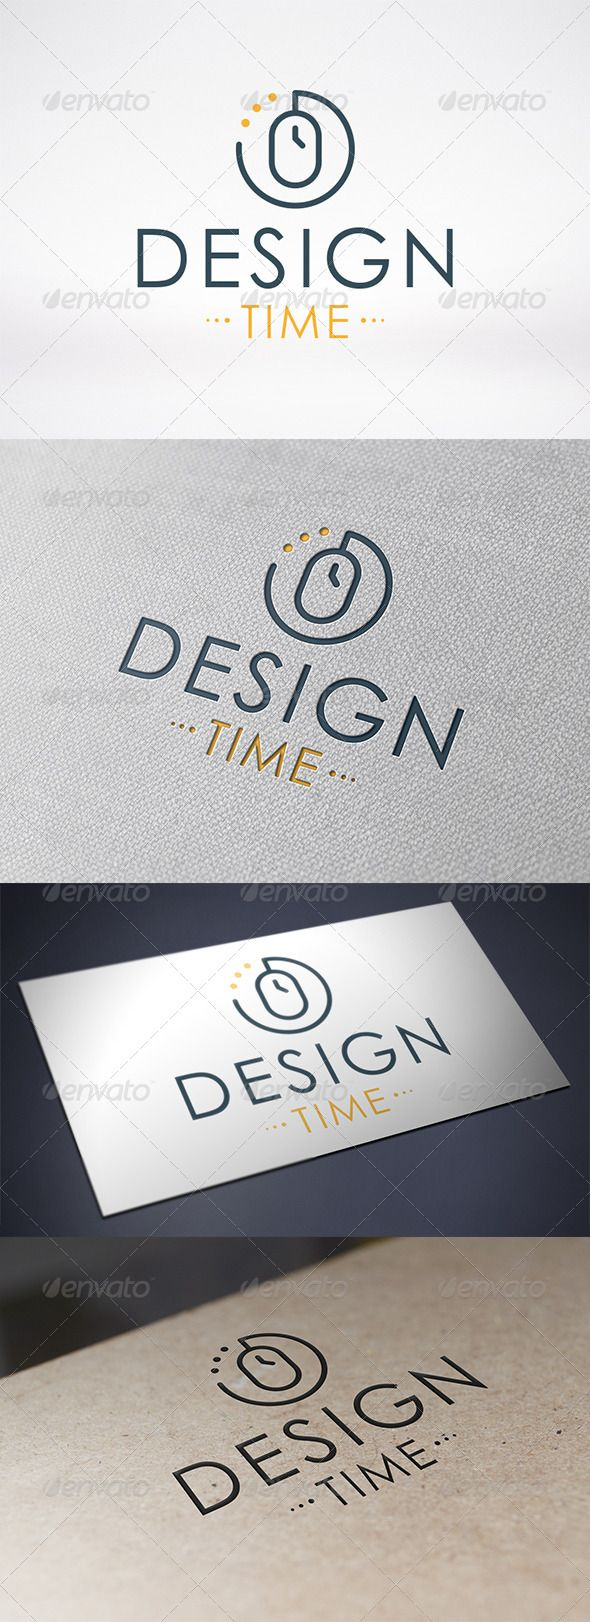 Logosmartz custom logo maker 5 0 review and download - Design Time Logo Template